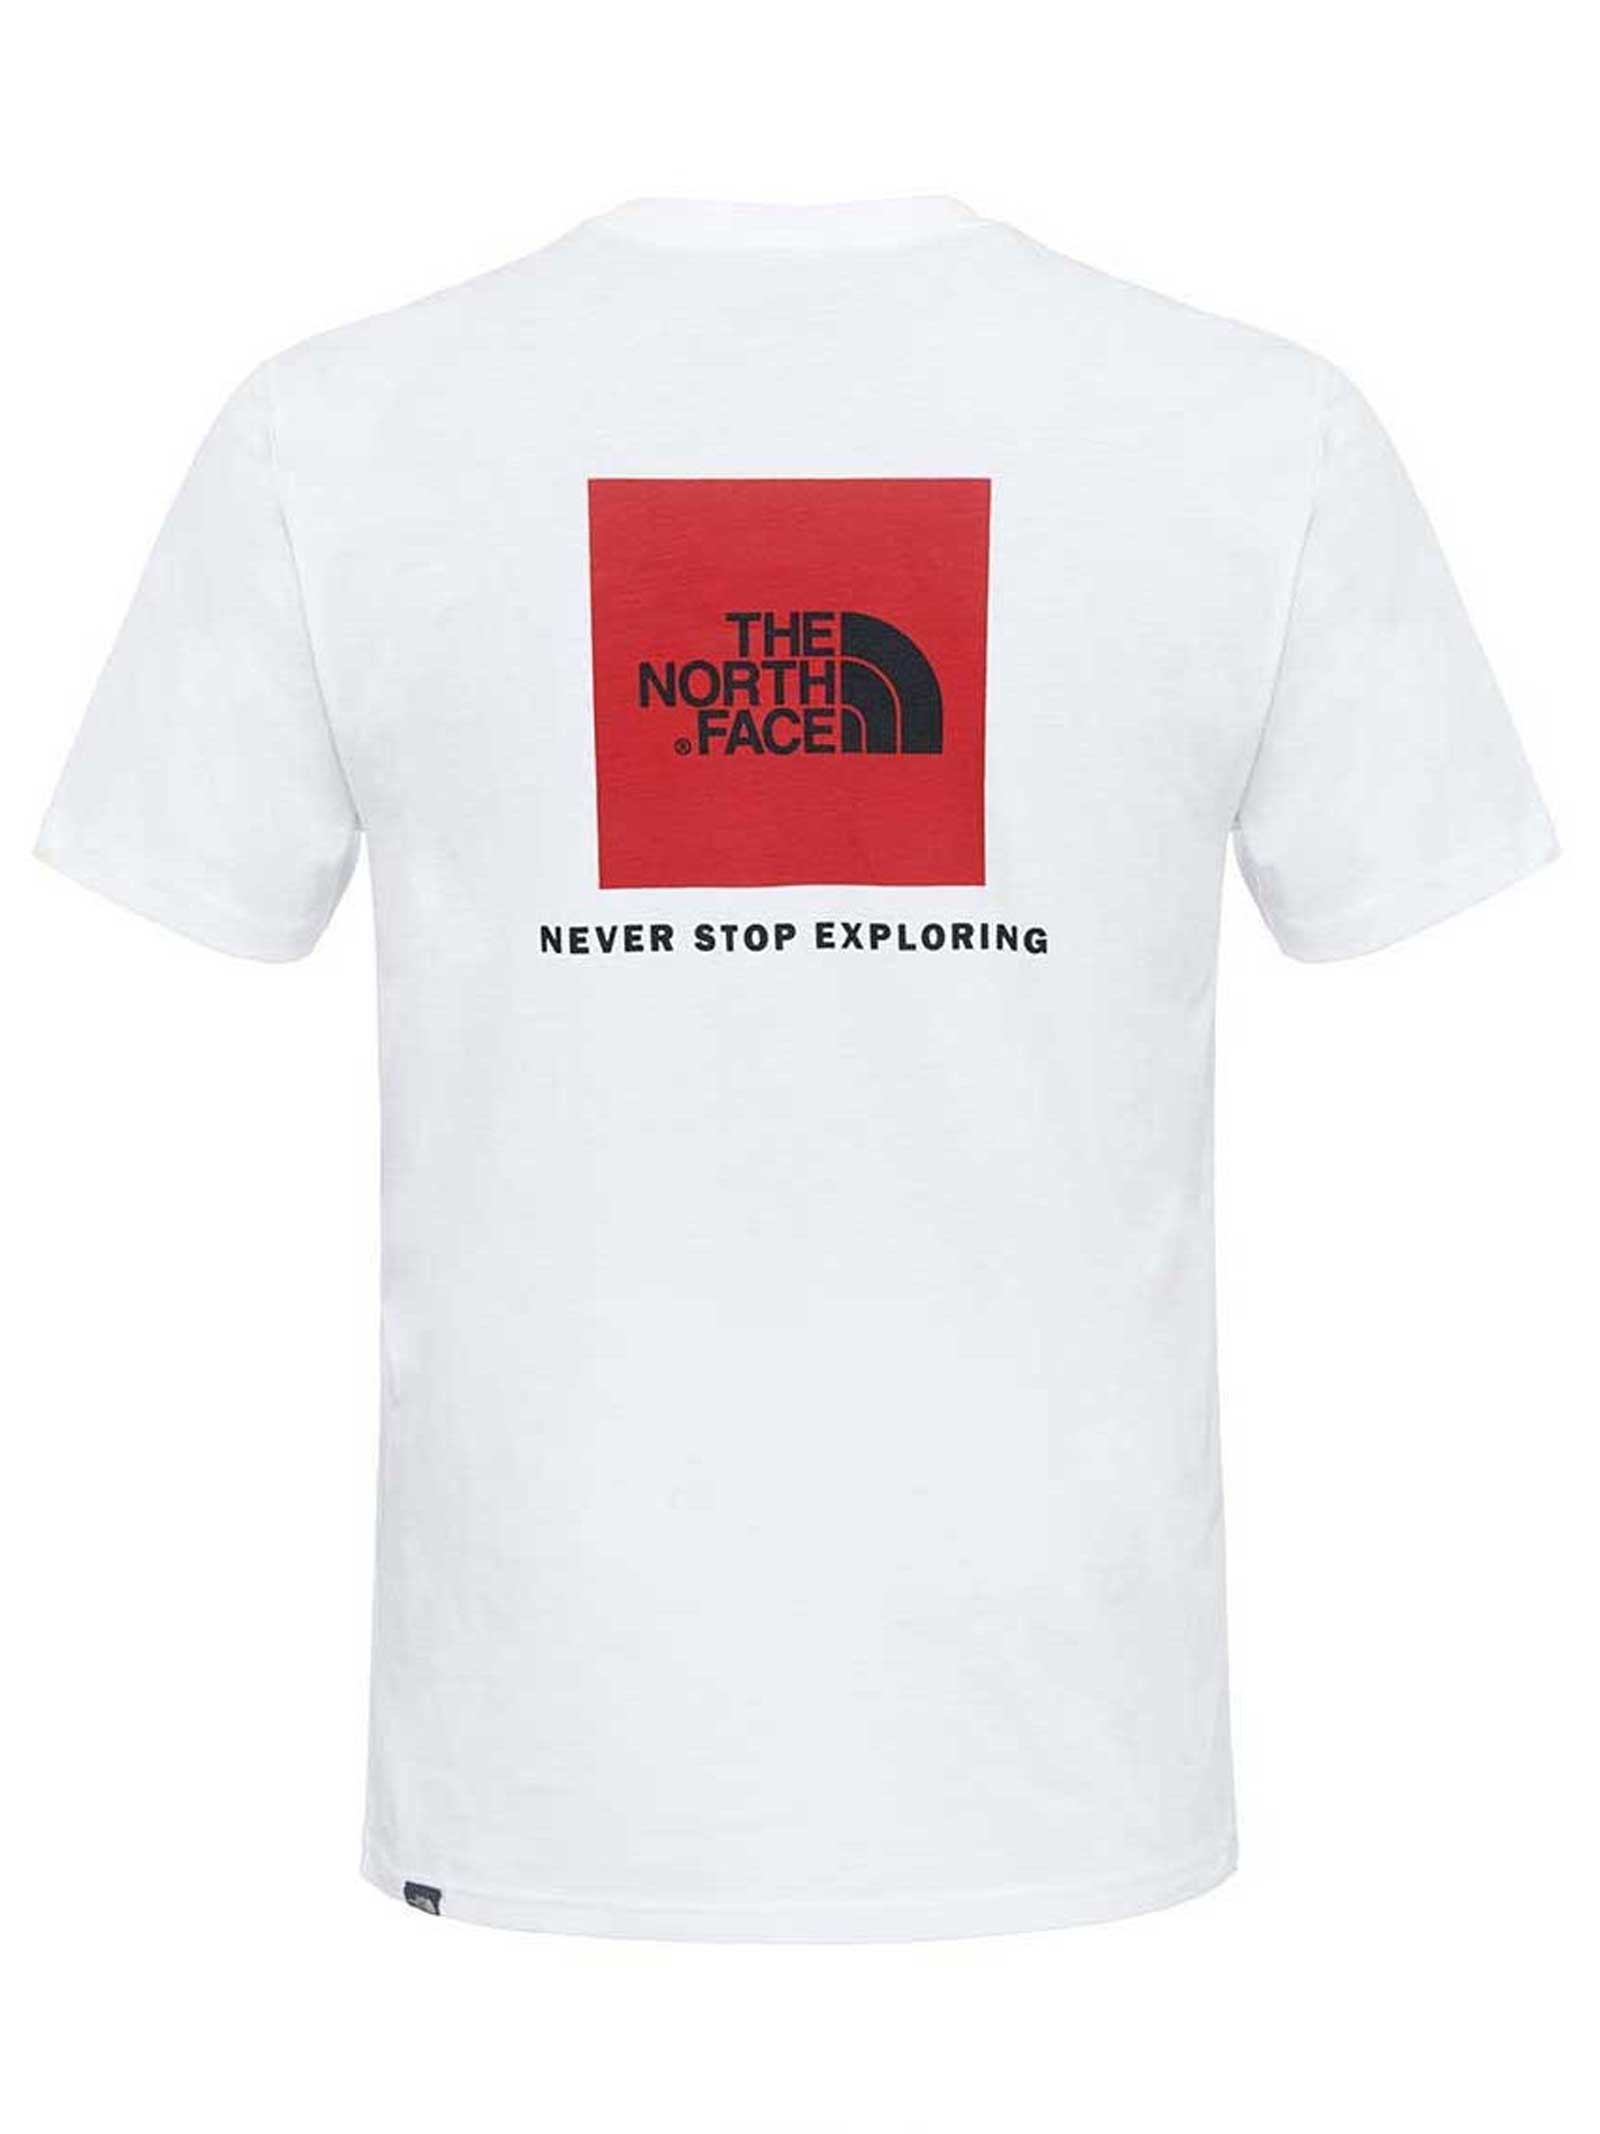 T-SHIRT THE NORTH FACE THE NORTH FACE   T-shirt   NF0A2TX2FN41